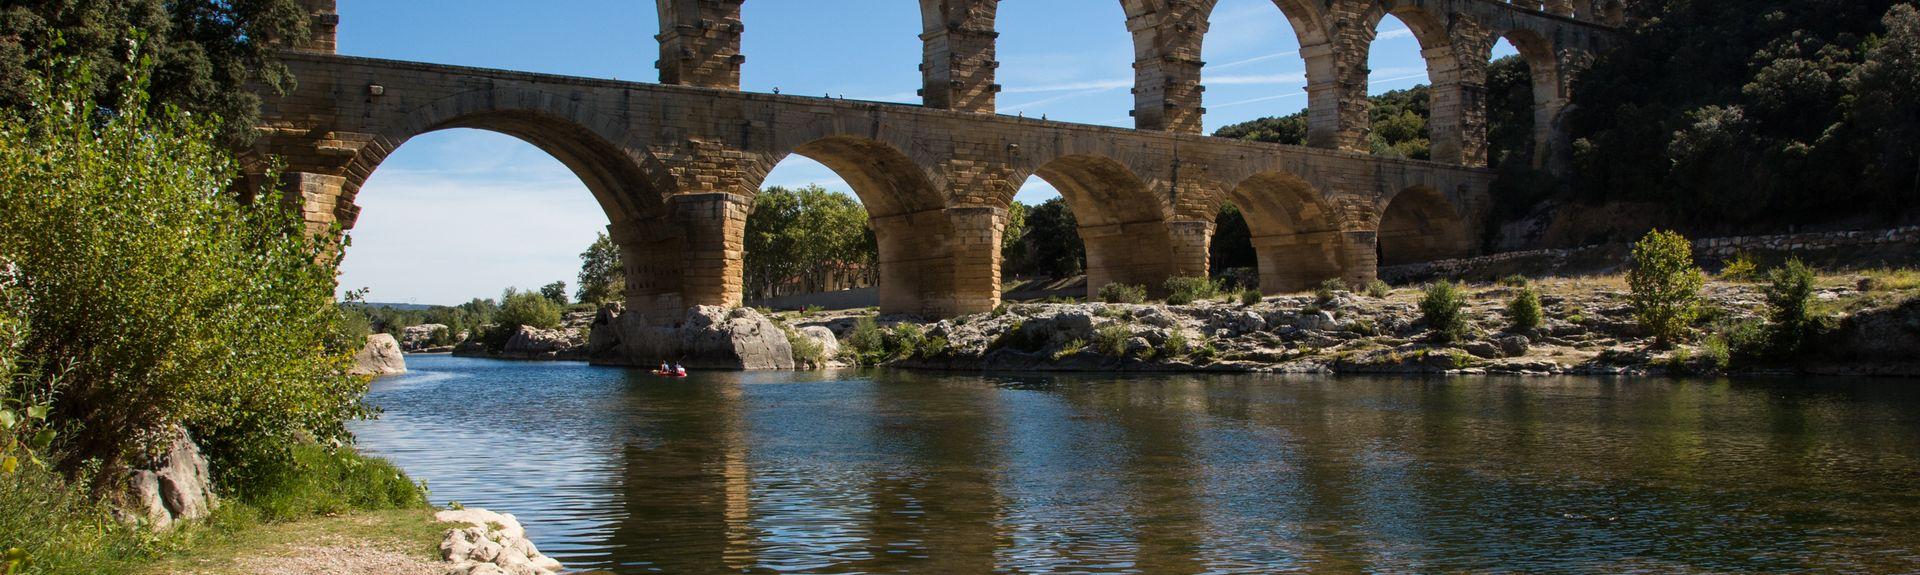 Villeneuve-les-Avignon, Gard, França